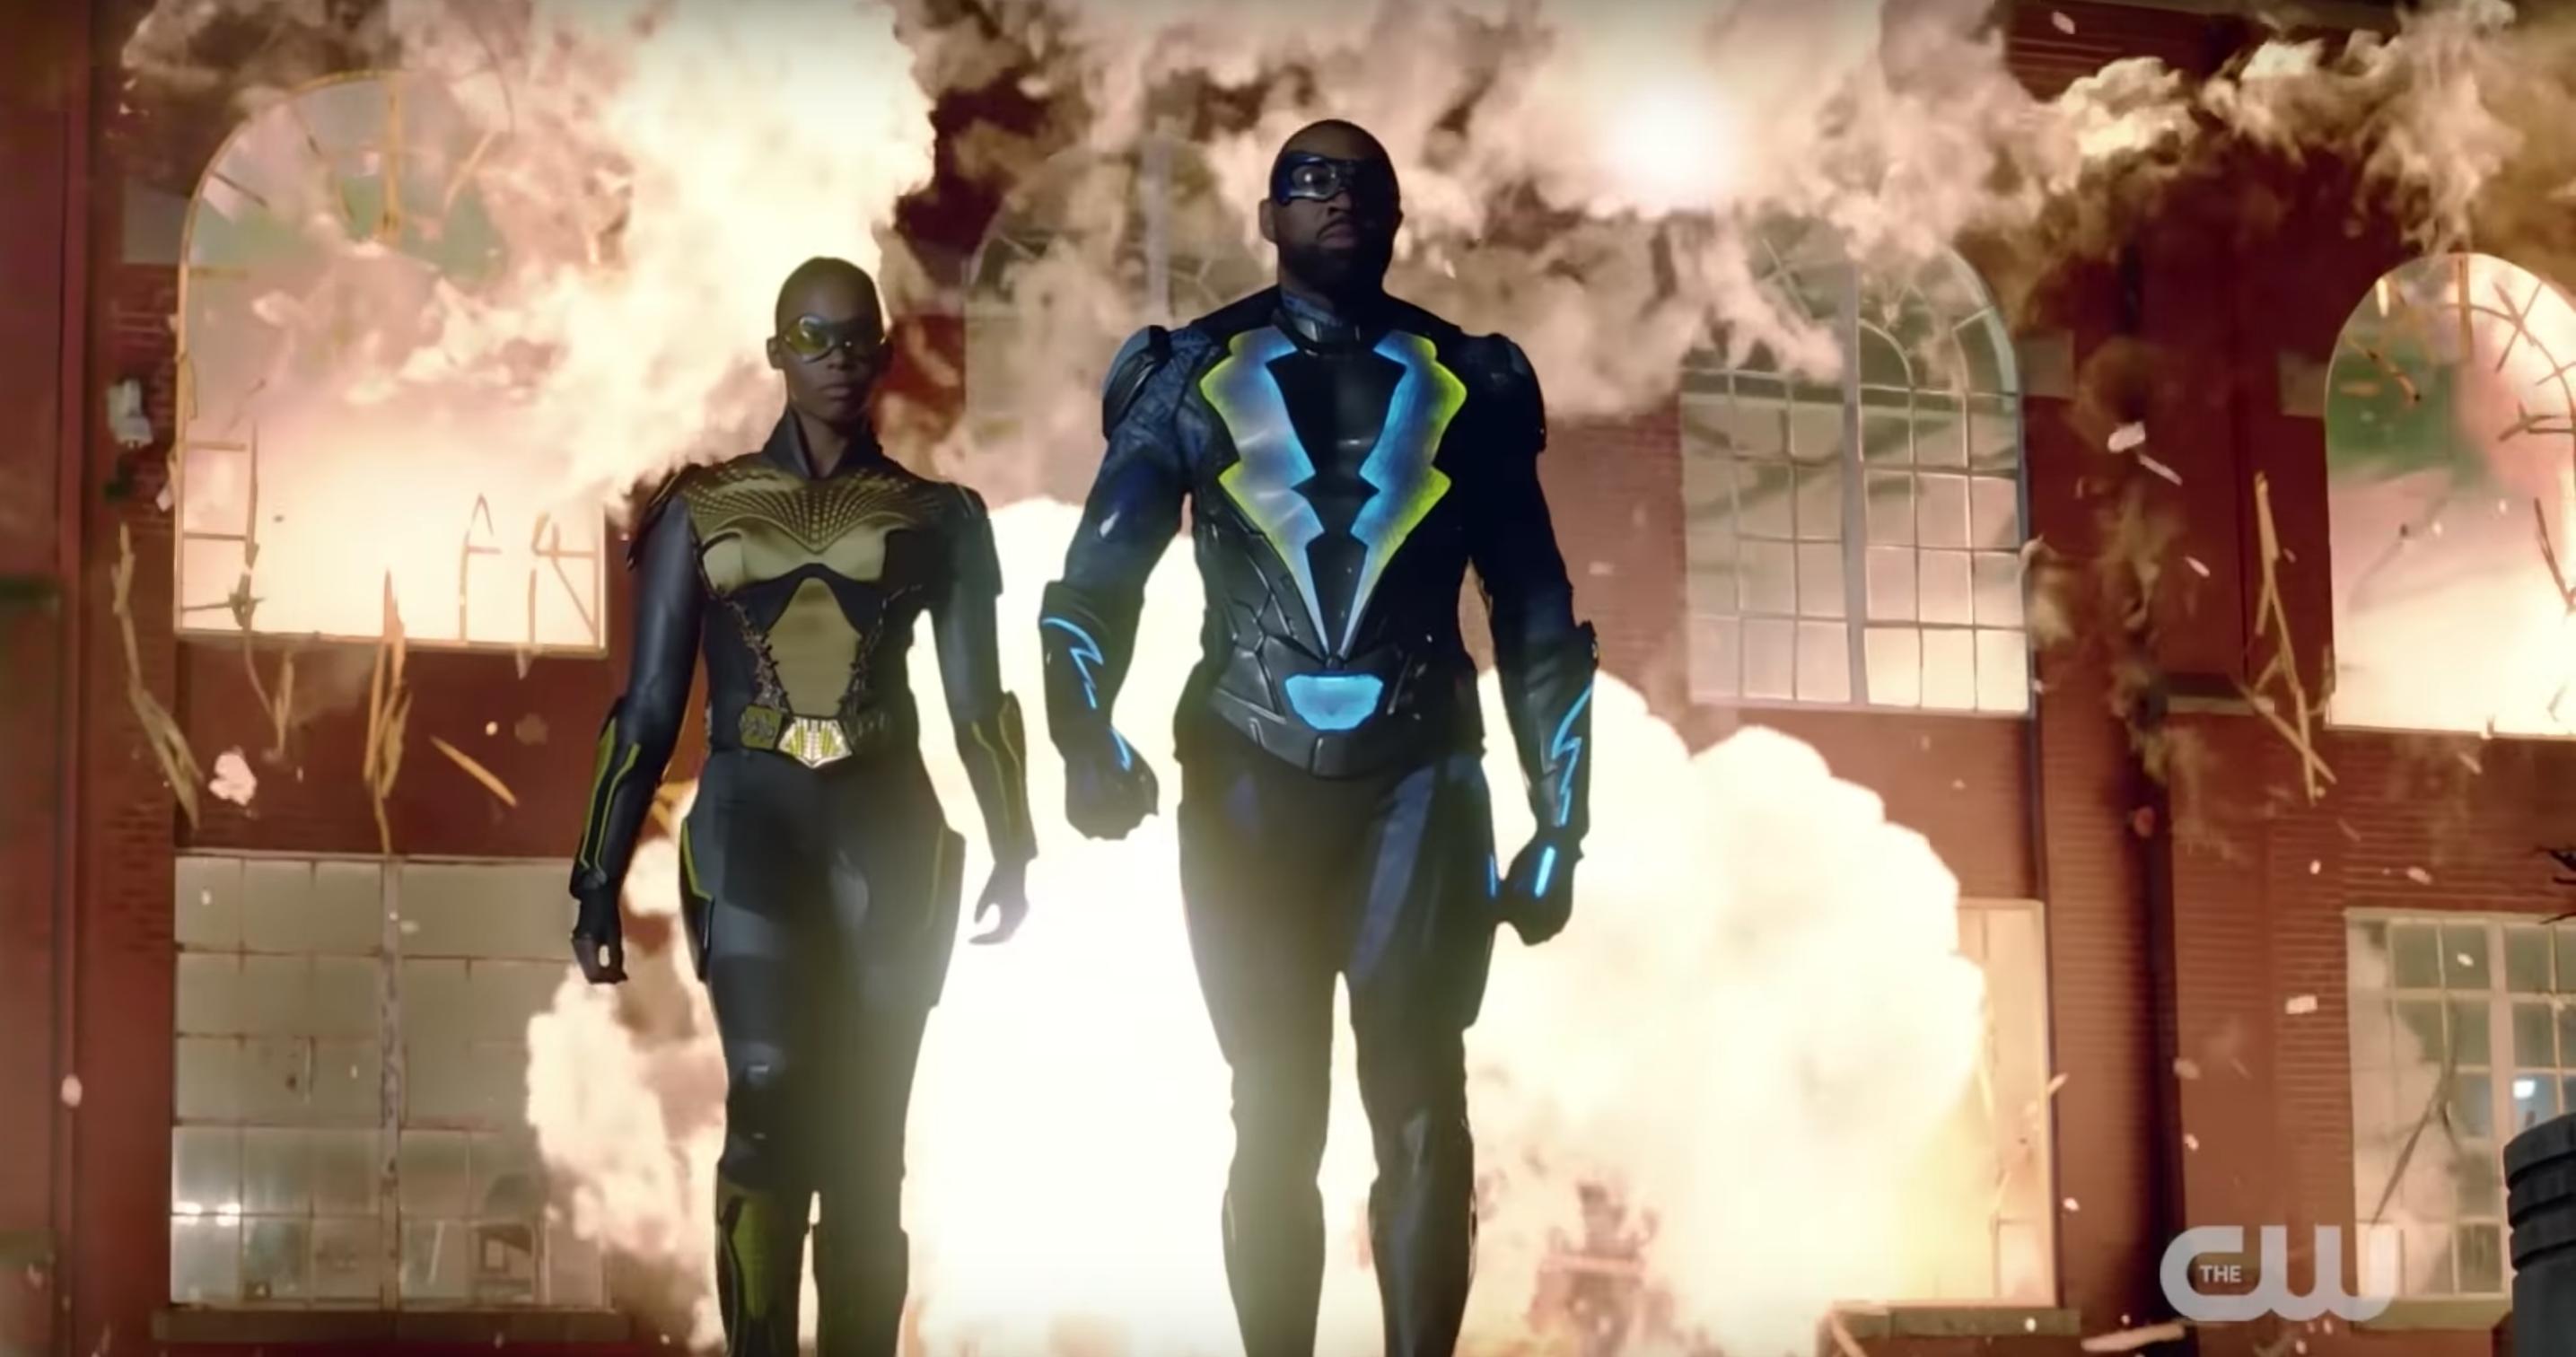 Black Lightning star reacts to Jefferson's new costume in season 3